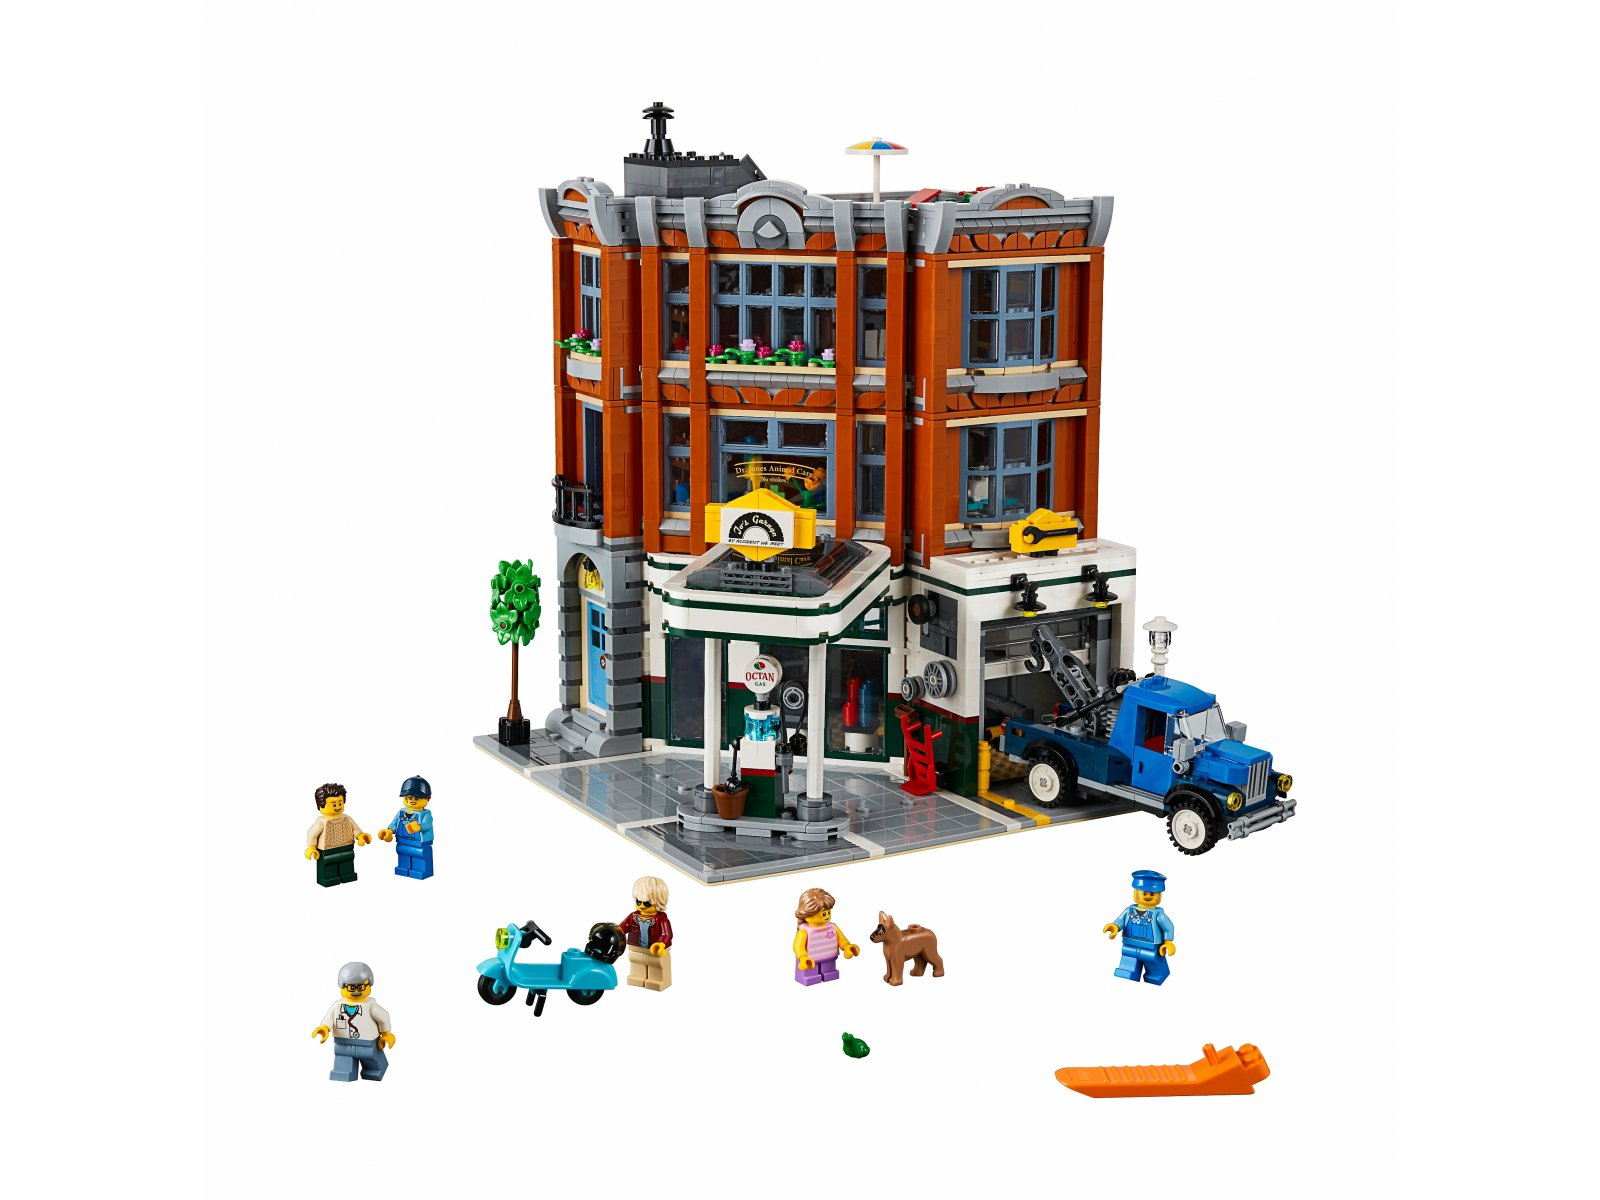 LEGO Creator Expert 10264 Warsztat na rogu